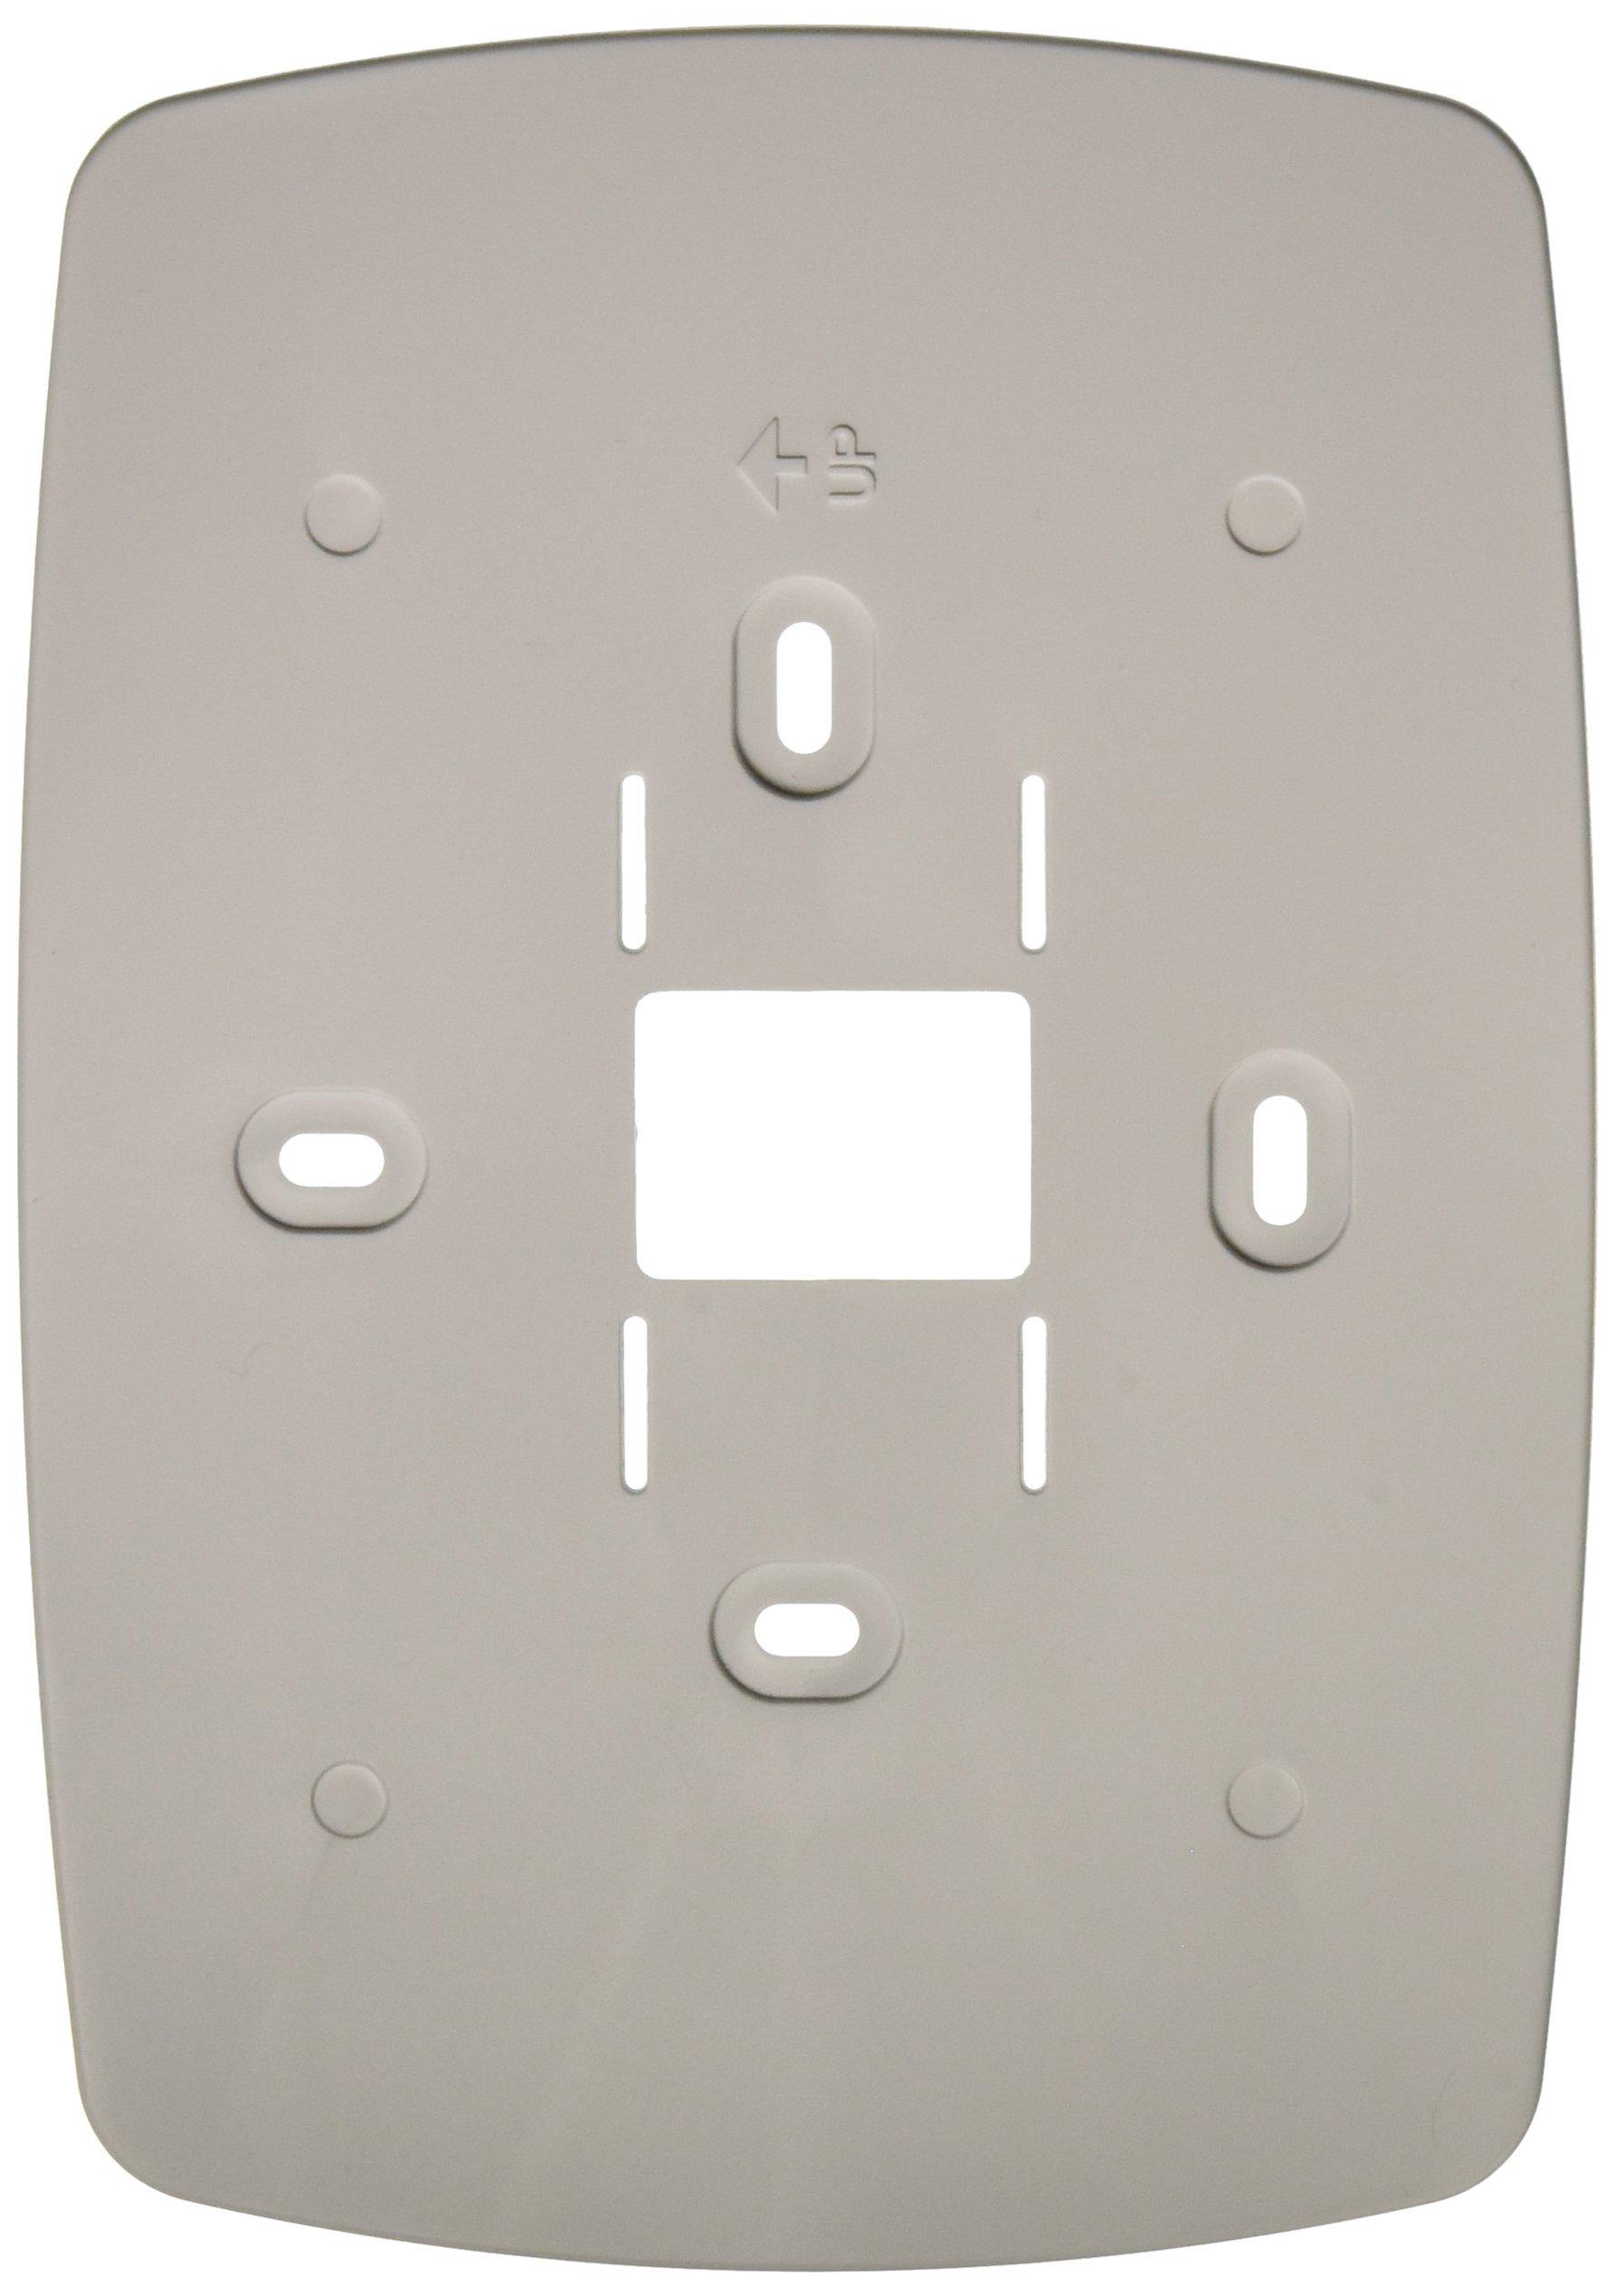 Honeywell 32003796001 Visionpro 8000 Series Wall Plate